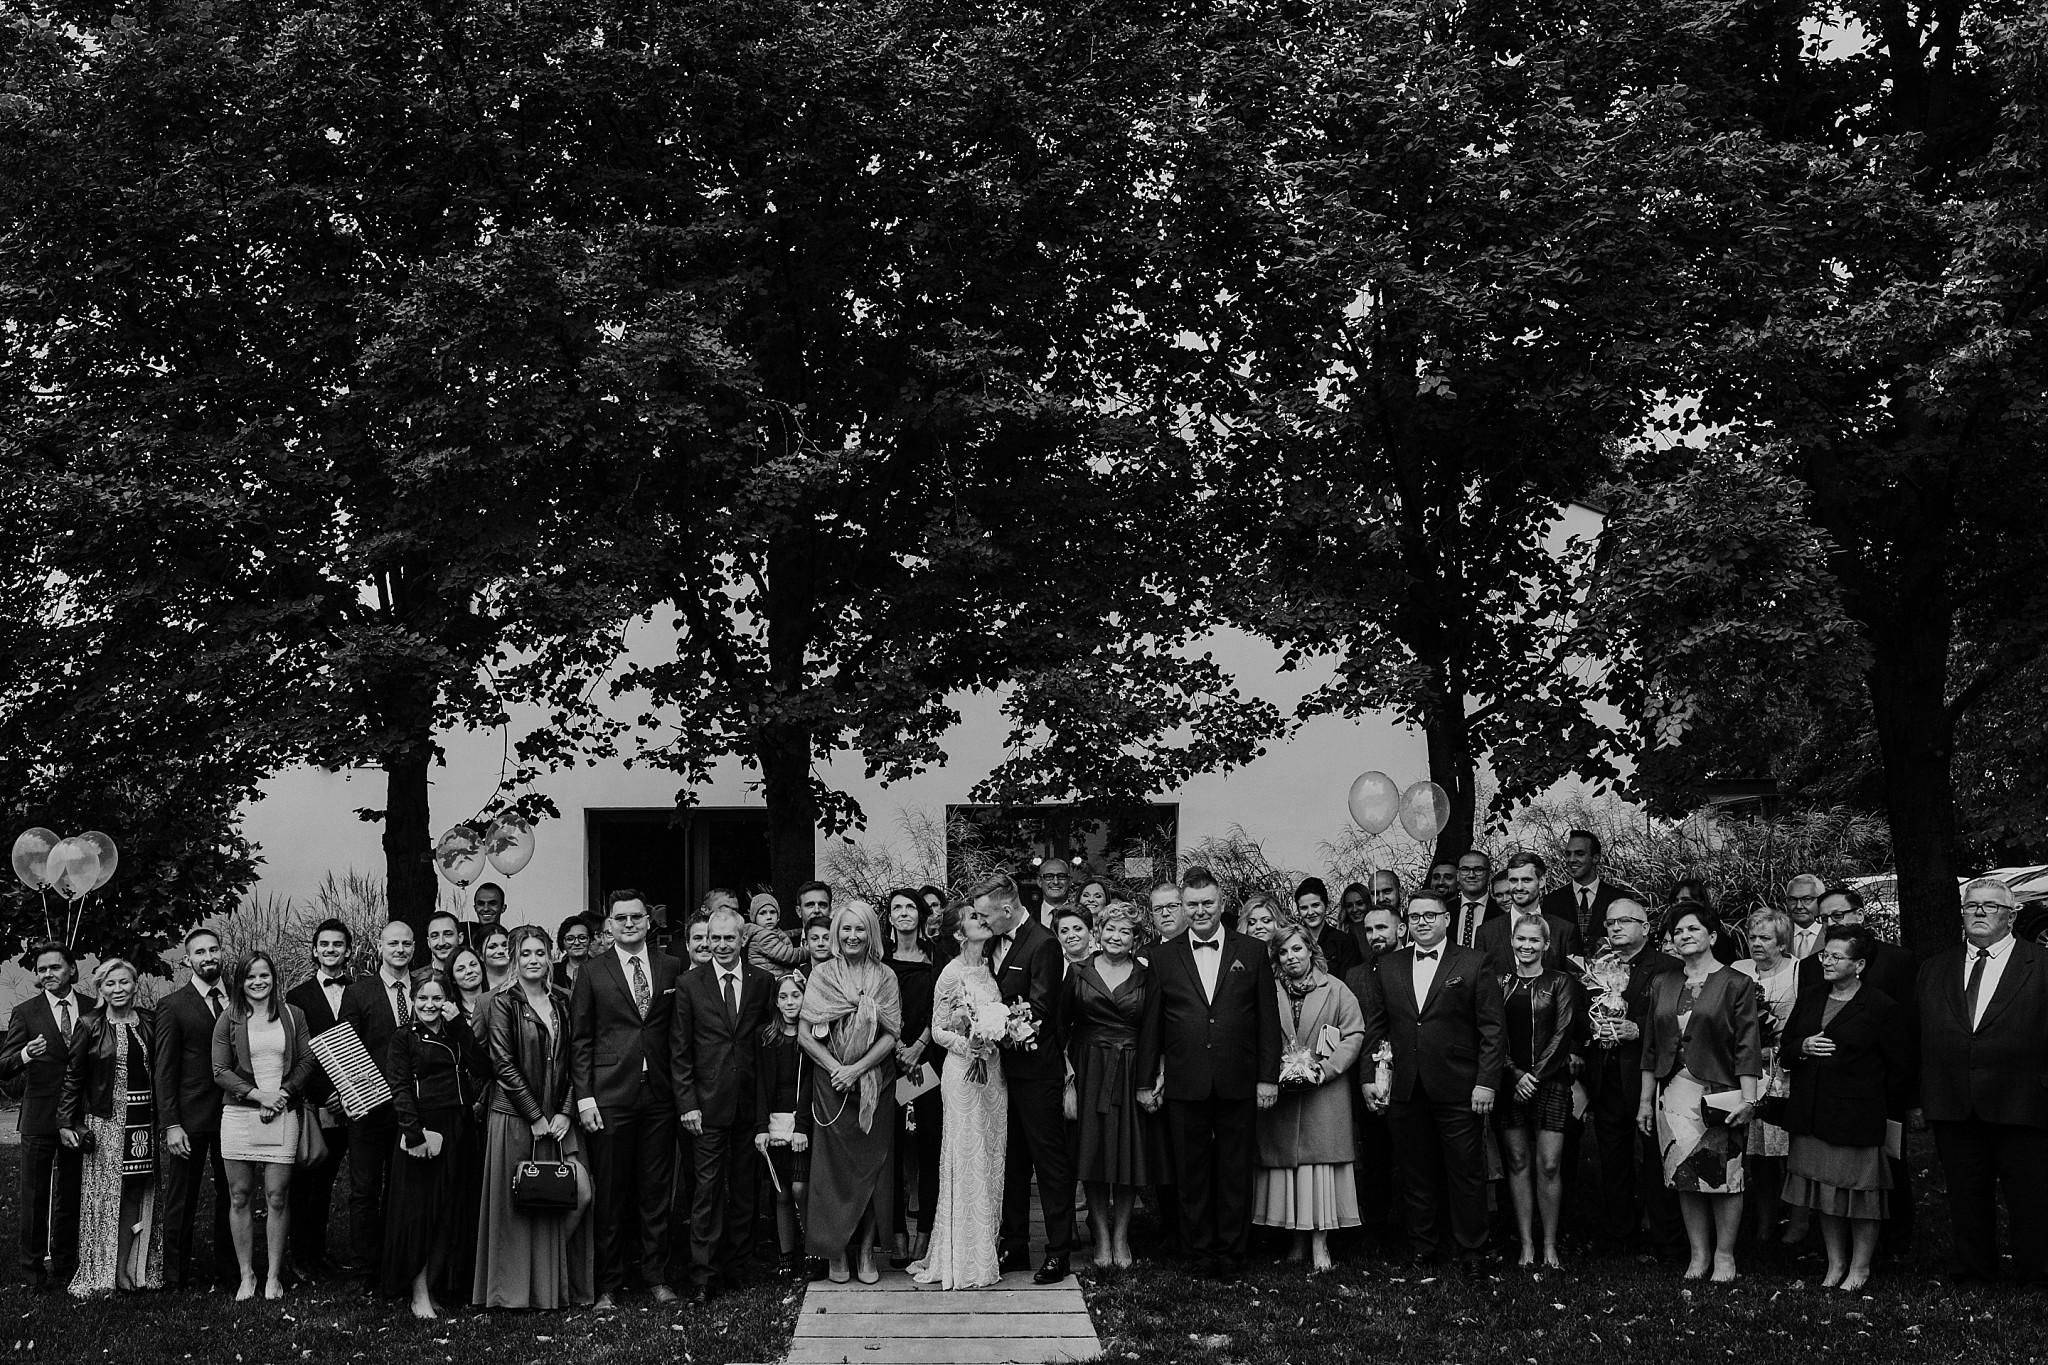 fotograf poznan wesele dobra truskawka piekne wesele pod poznaniem wesele w dobrej truskawce piekna para mloda slub marzen slub koronawirus slub listopad wesele koronawirus 261